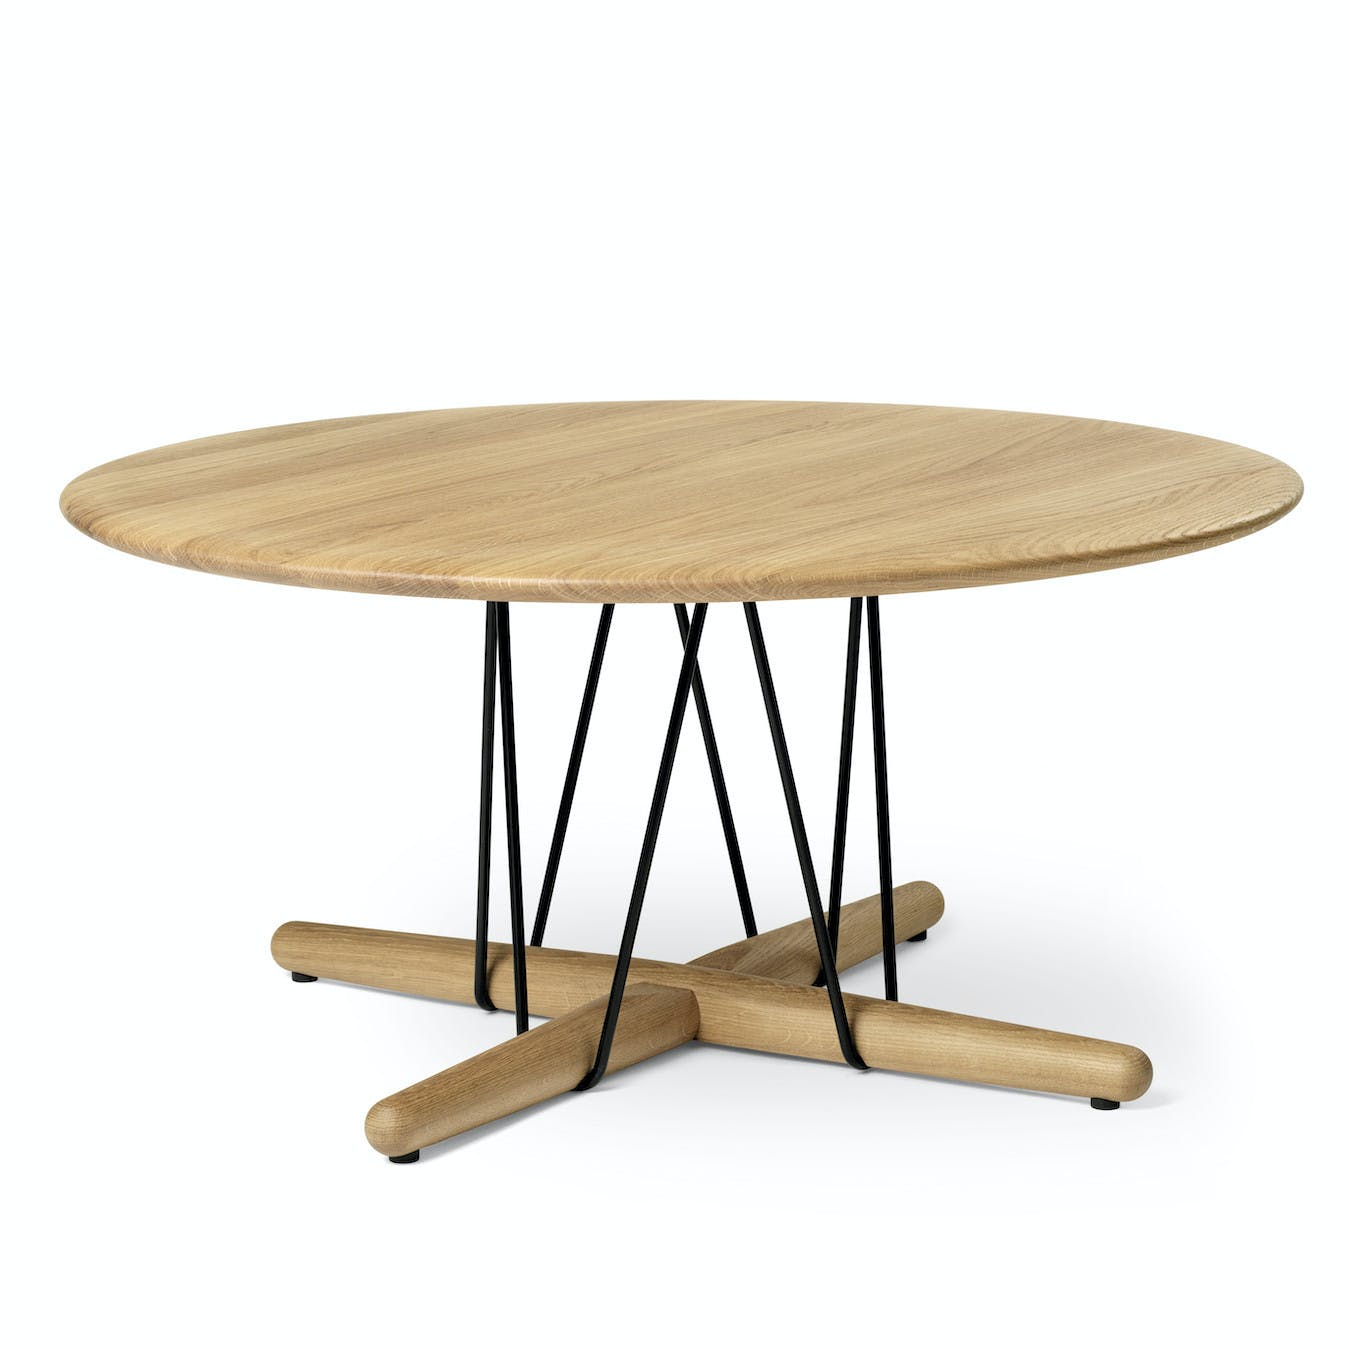 Carl-hansen-oak-e020-embrace-table-haute-living